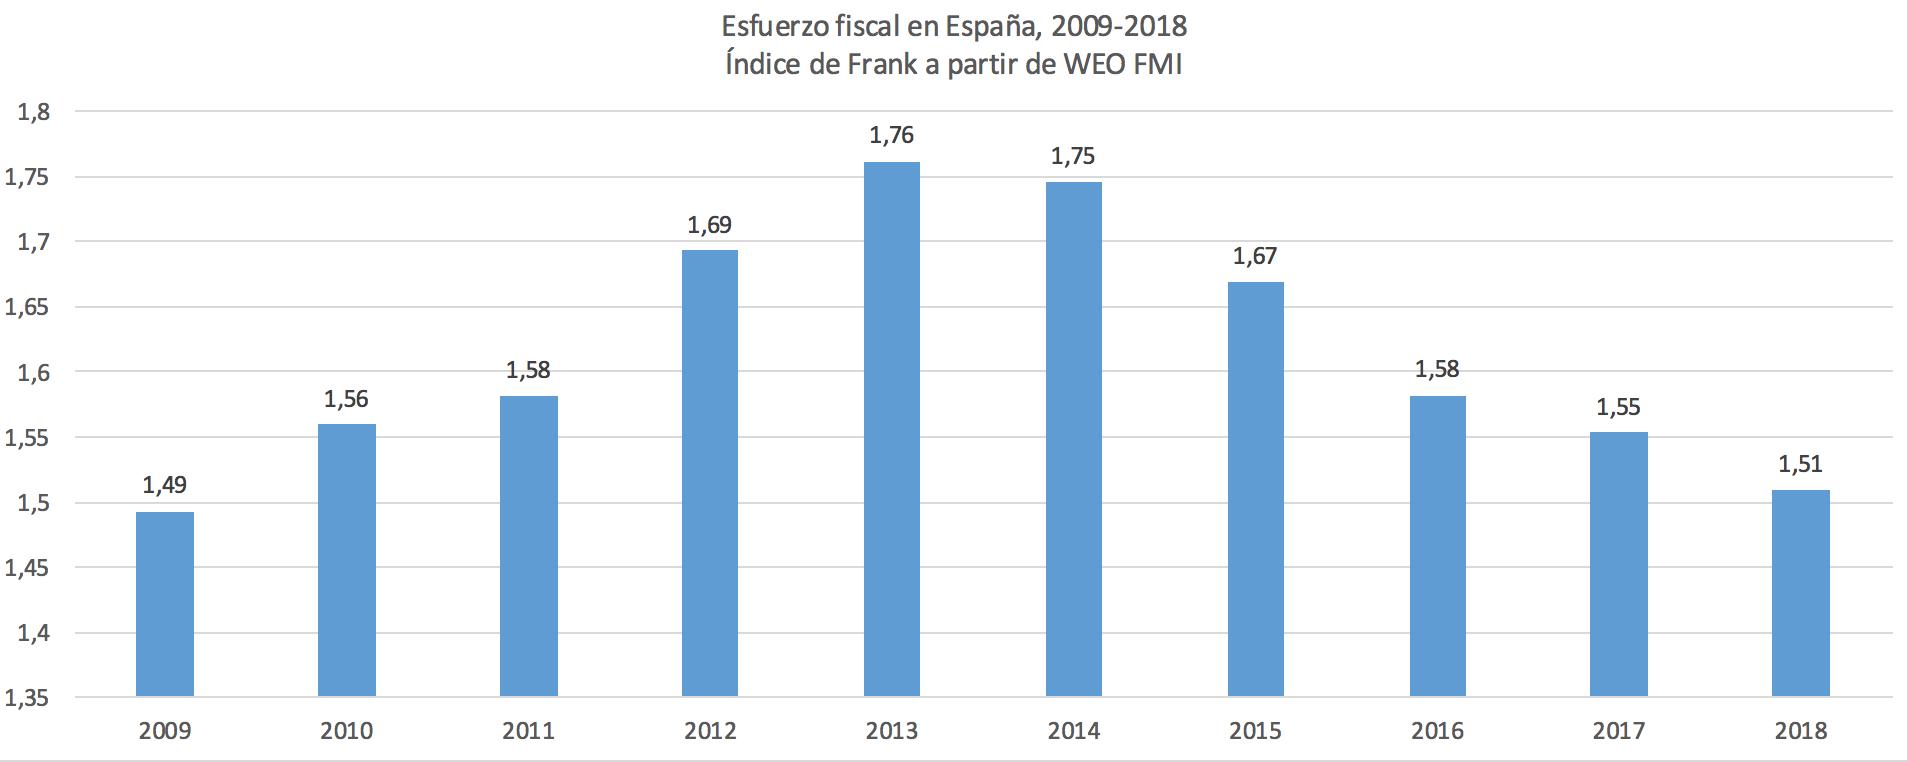 2-indice-frank-espana.png